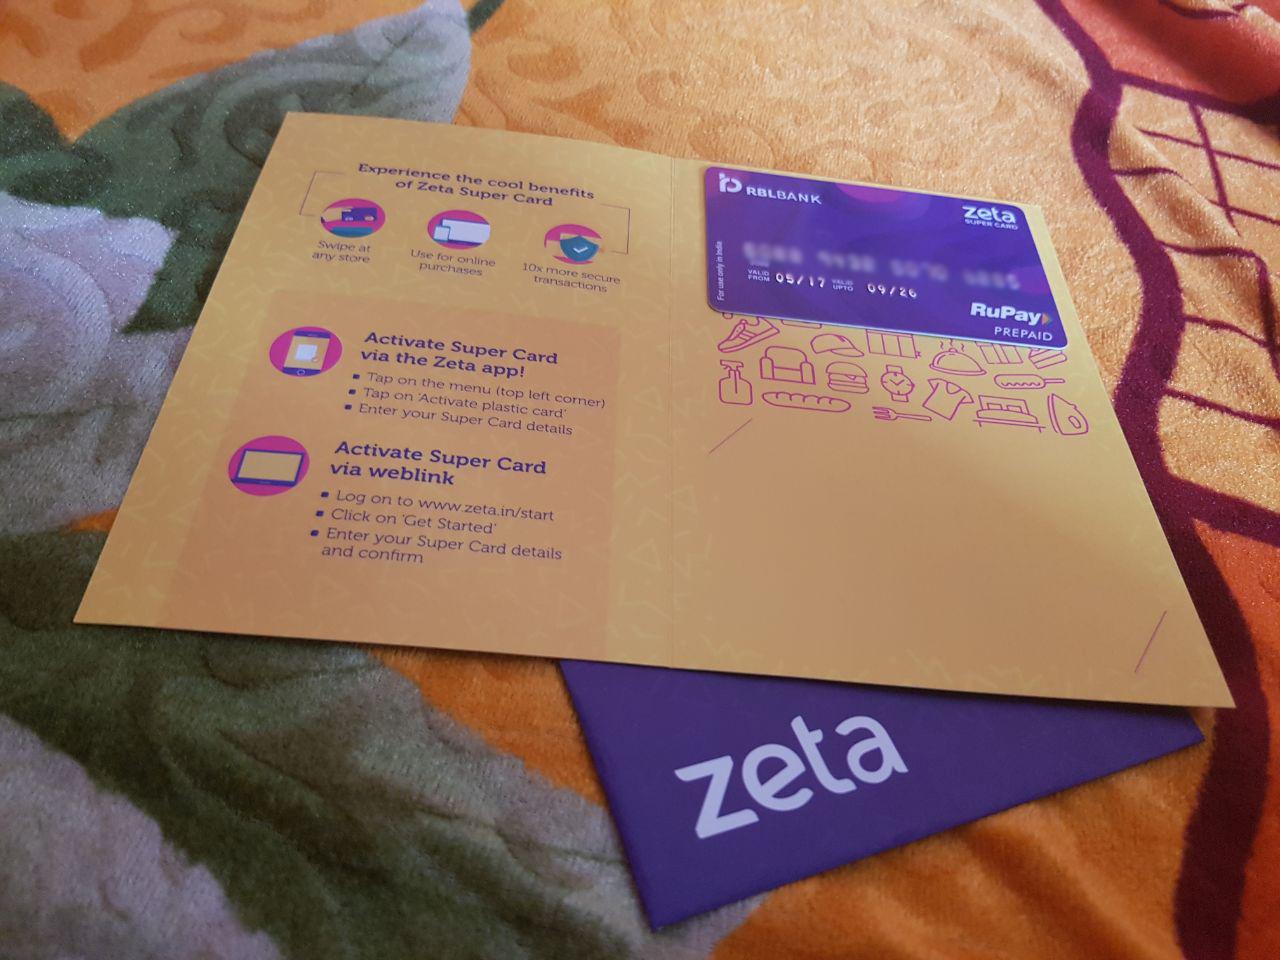 Zeta Mobile Wallet